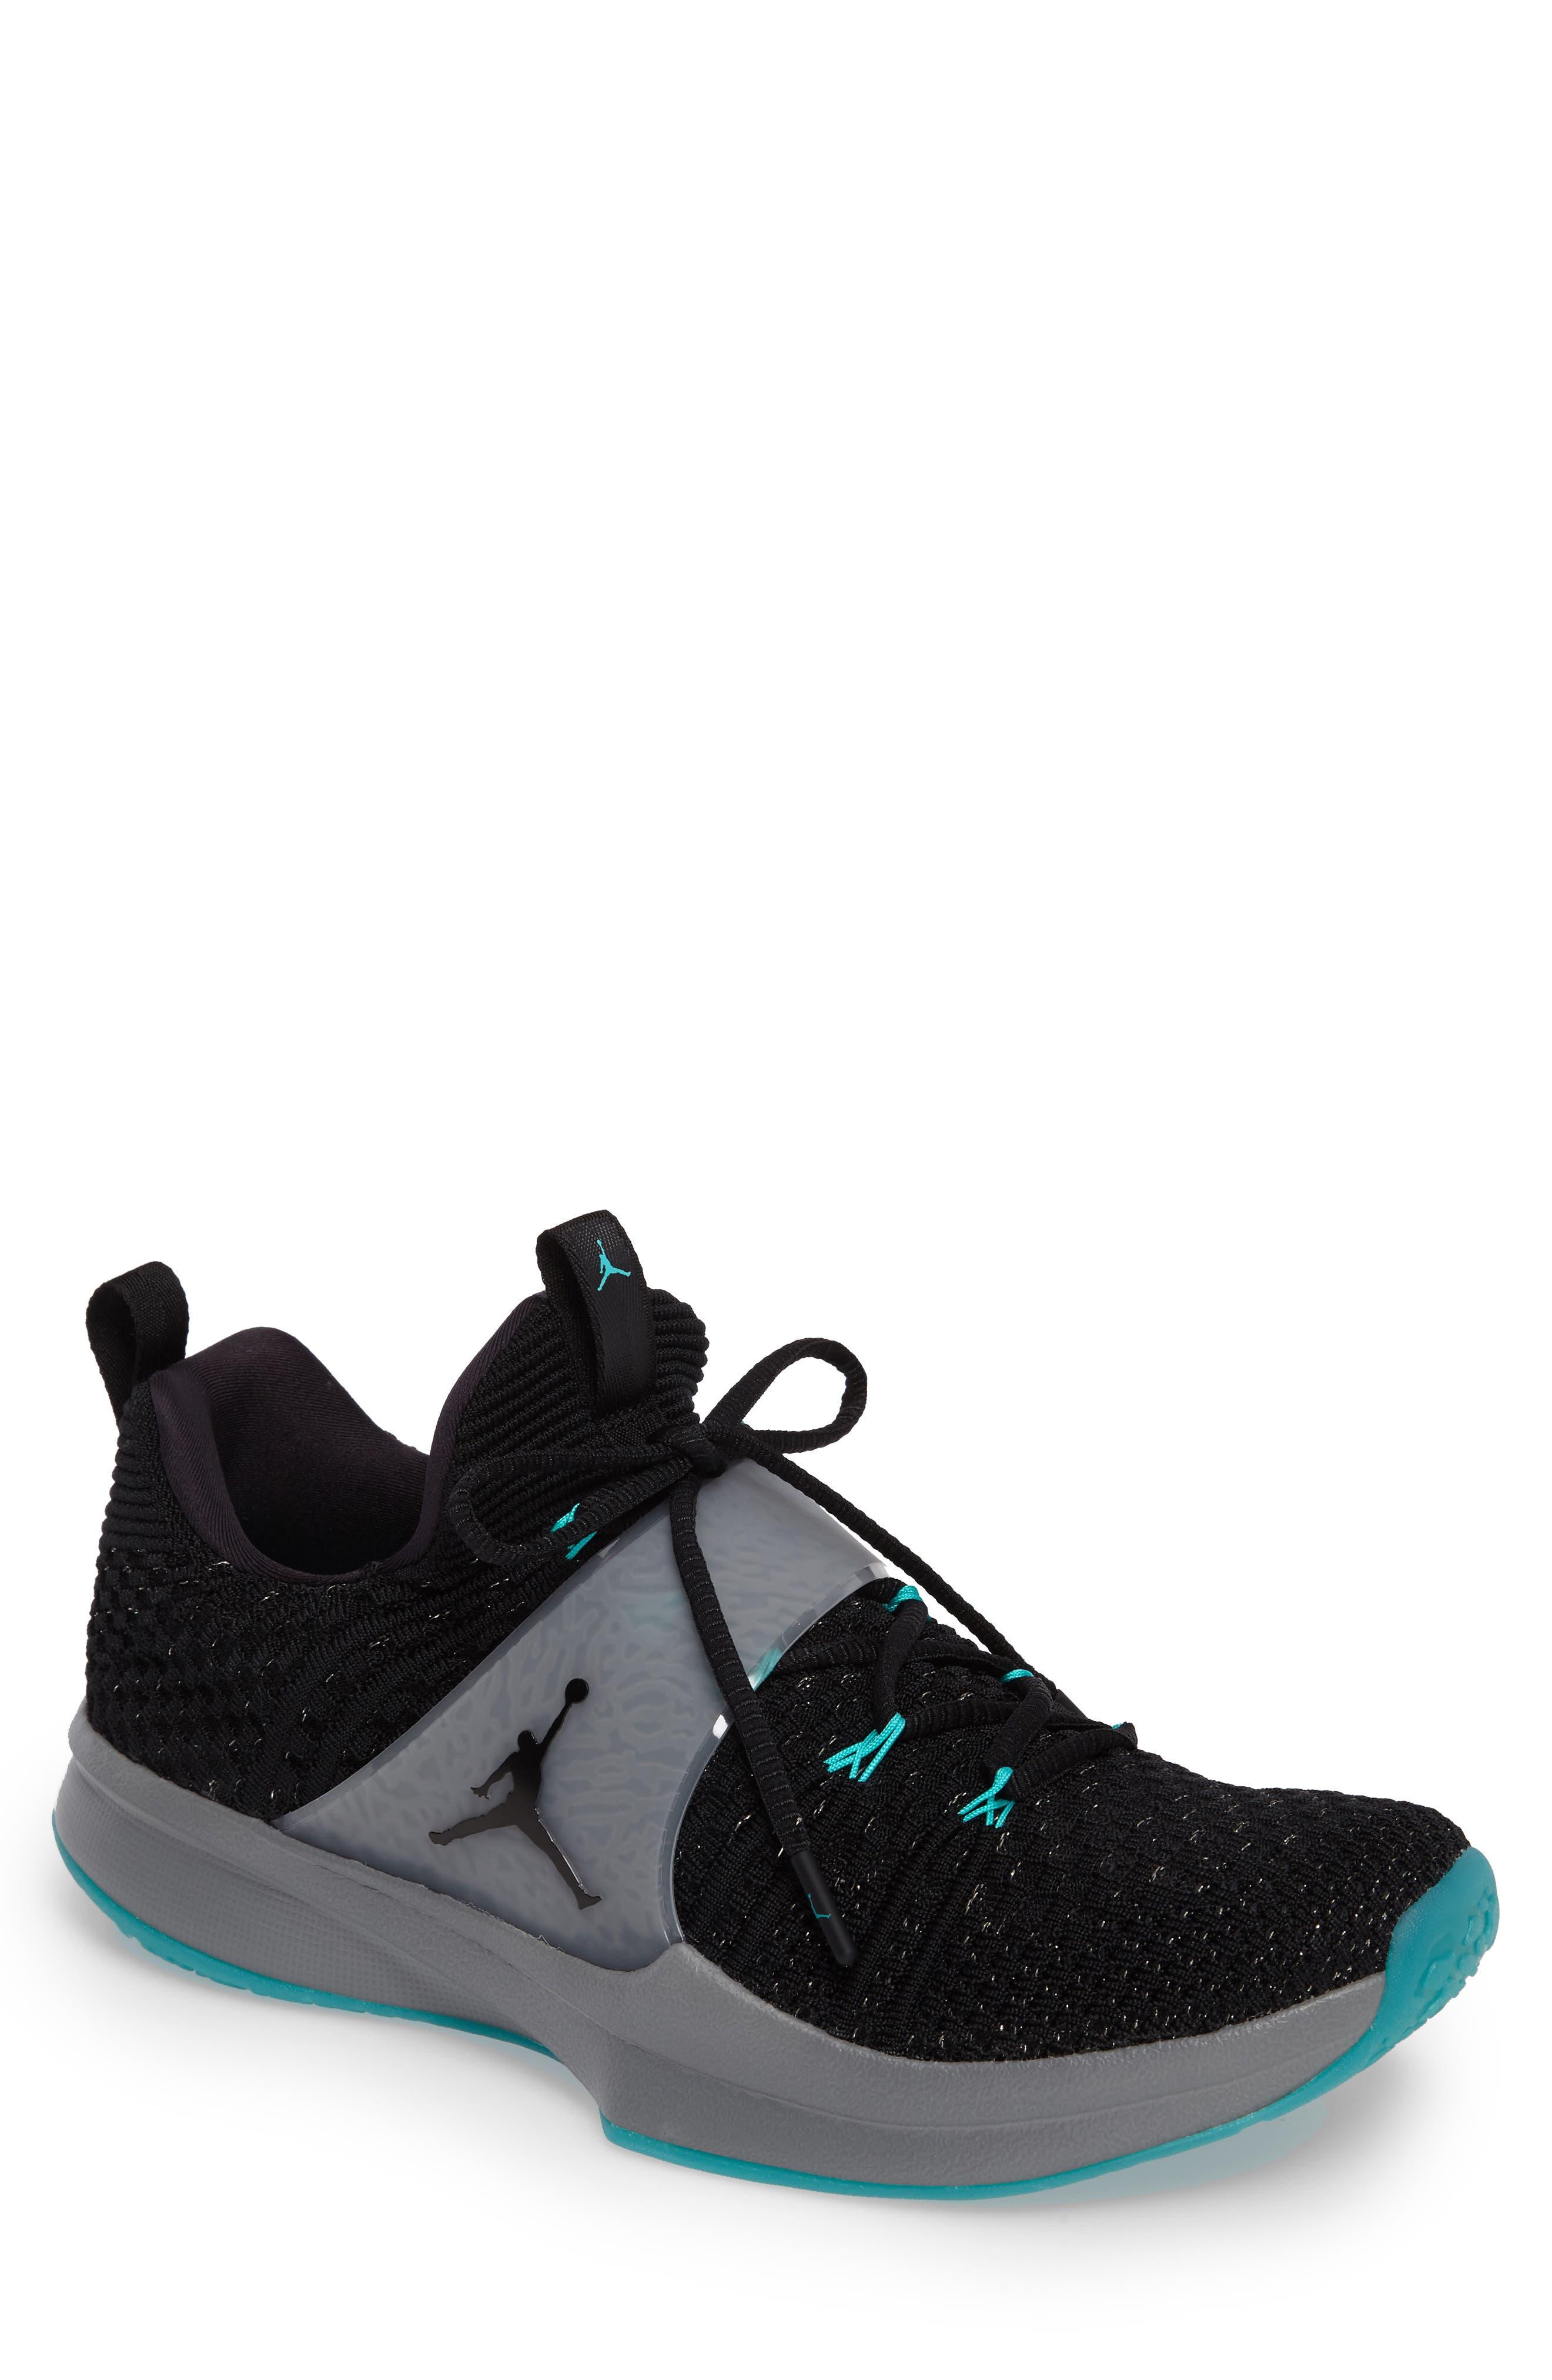 Jordan Flyknit Trainer 2 Low Sneaker,                             Main thumbnail 3, color,